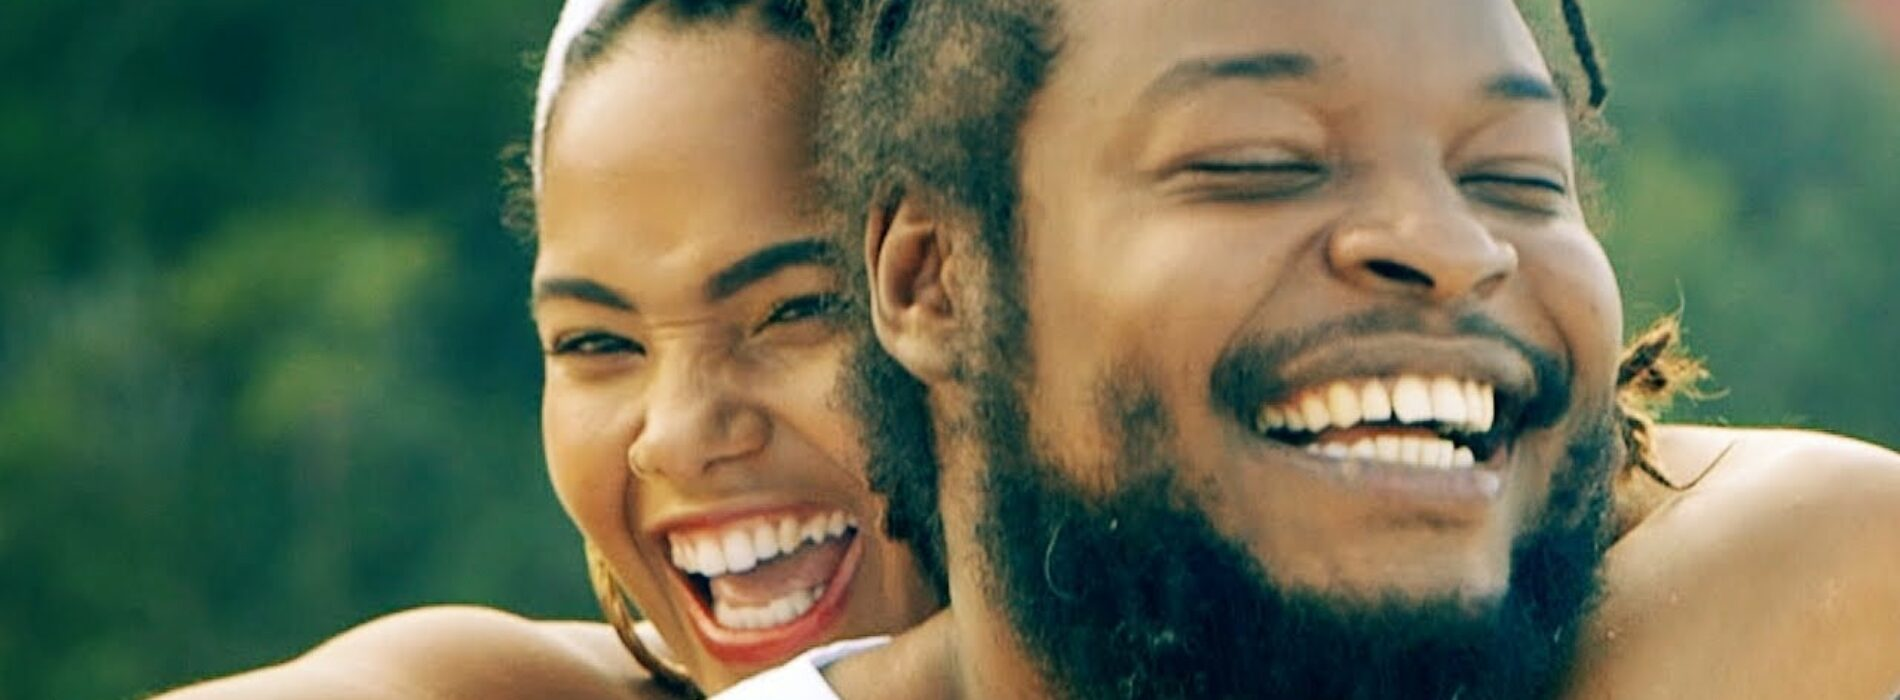 Pressure Busspipe – True Love [Official Video 2021] – Mai 2021